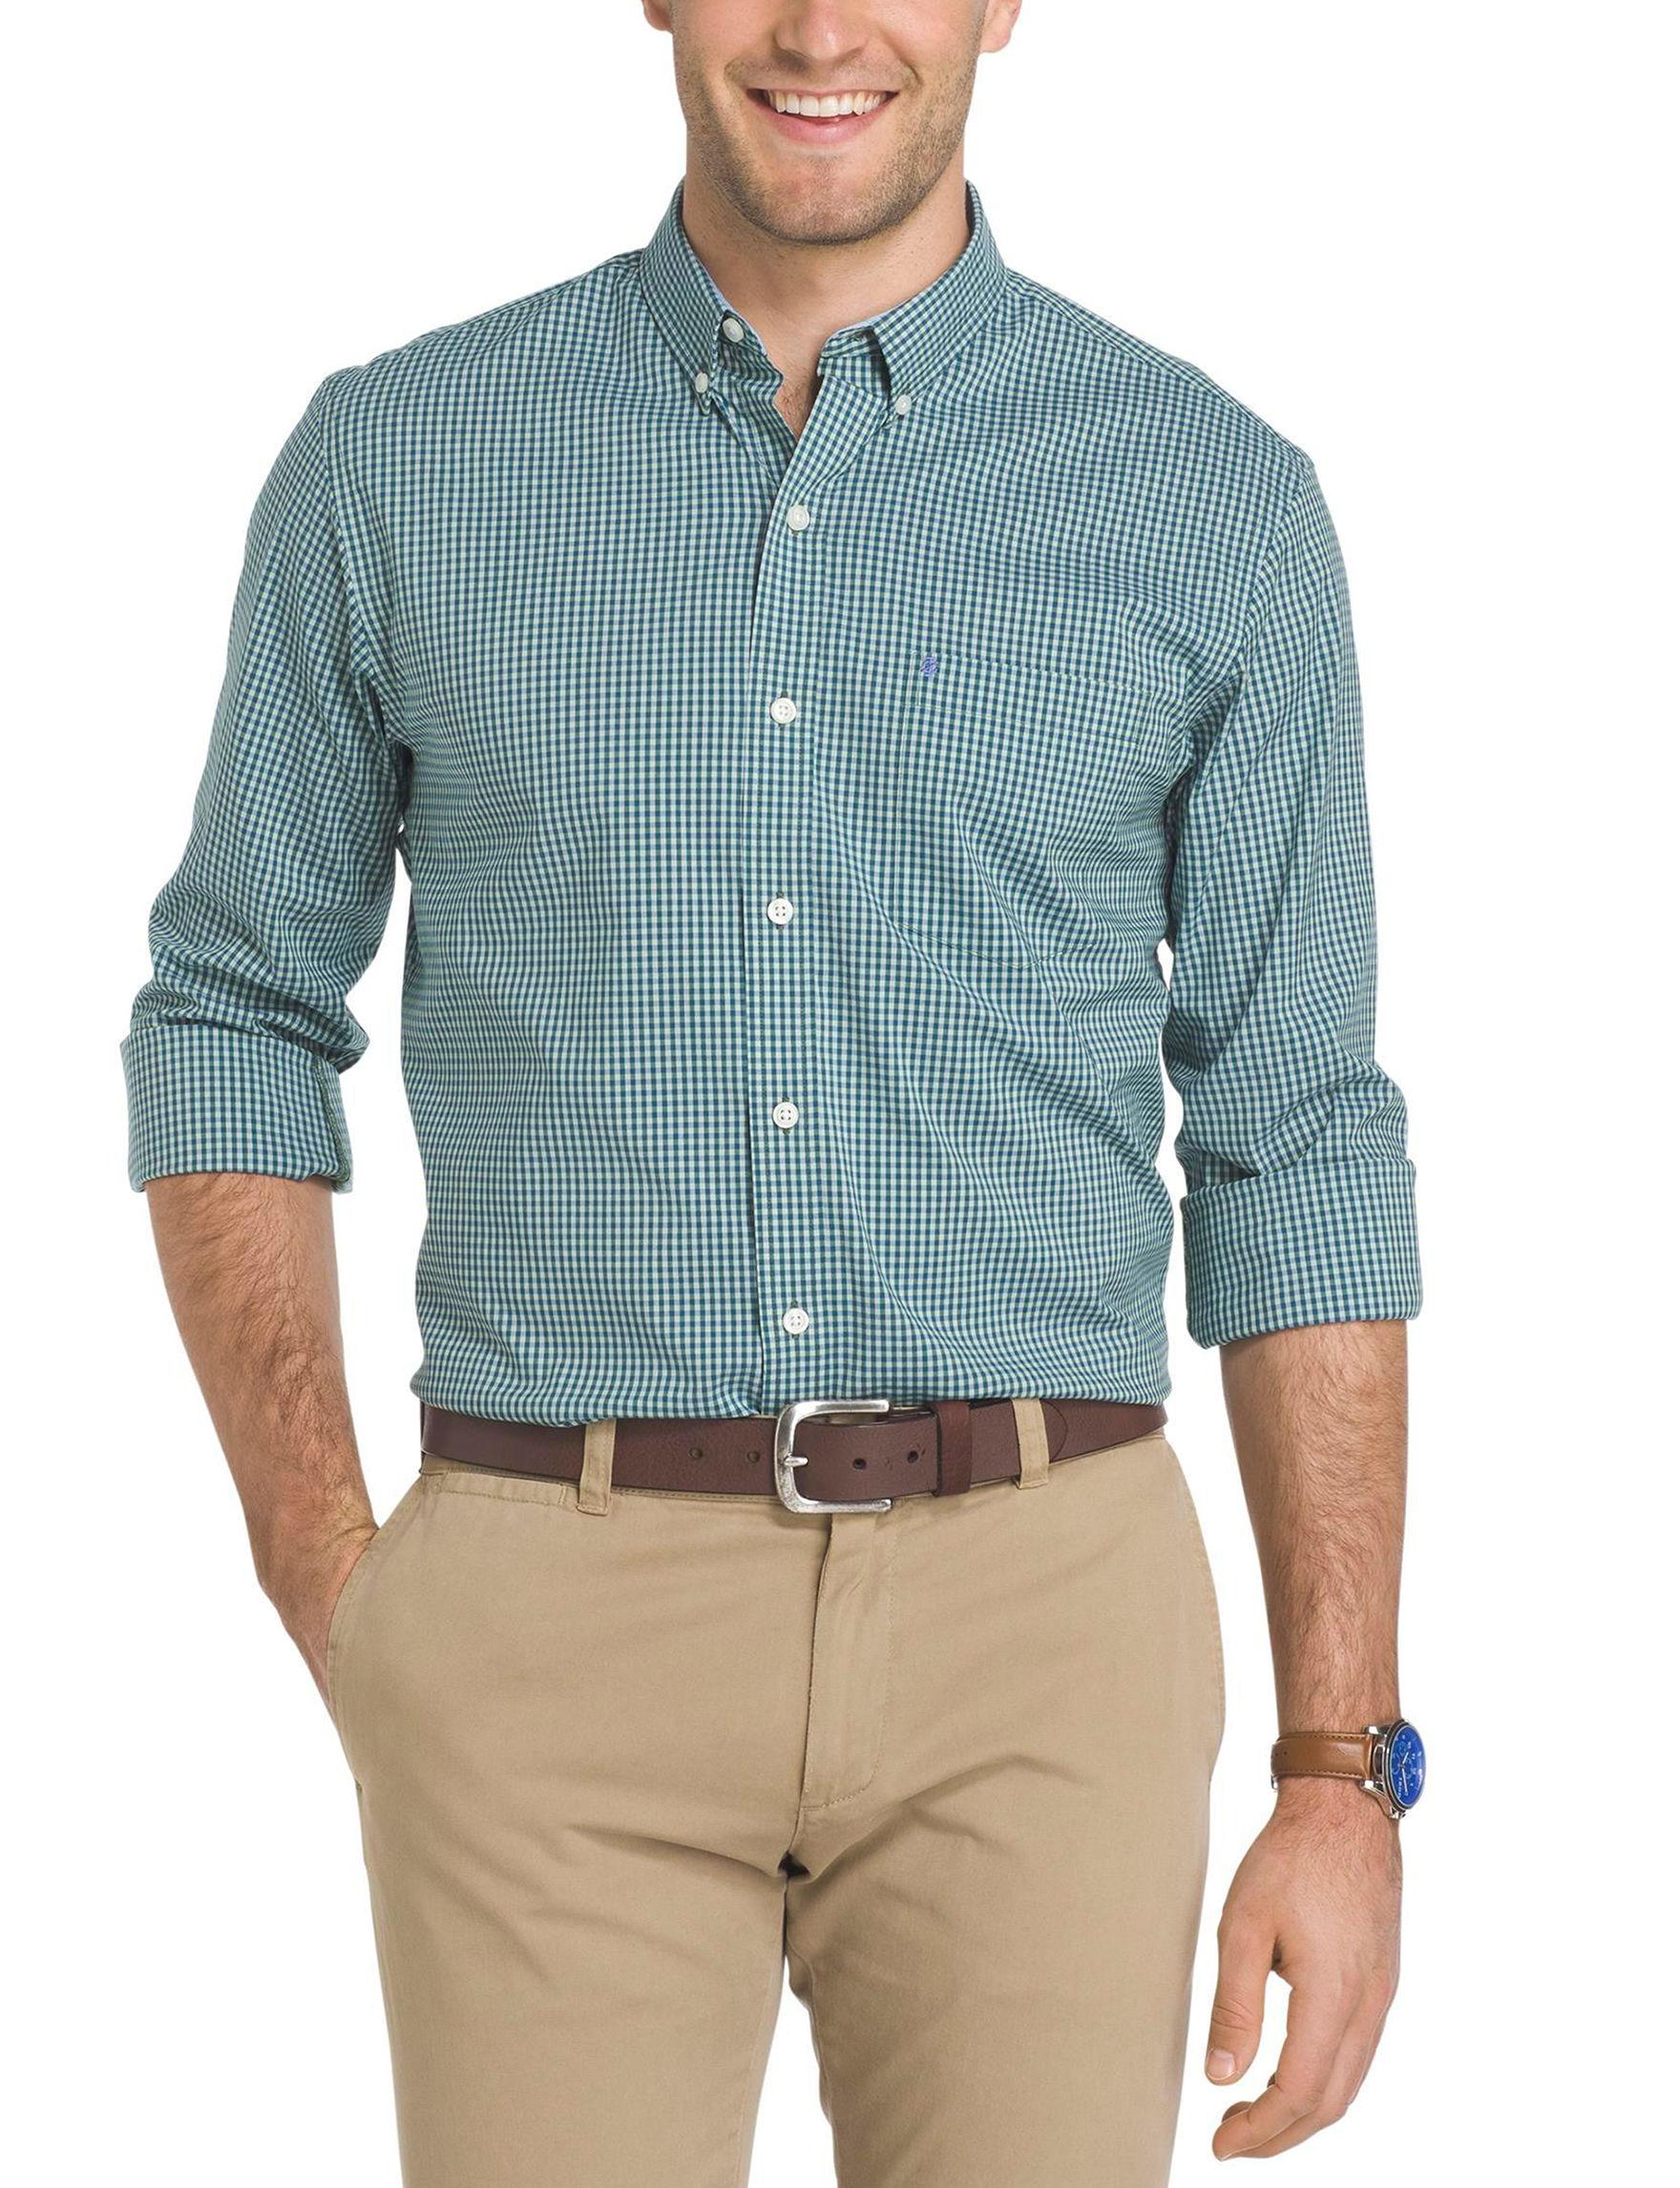 Izod Green Casual Button Down Shirts